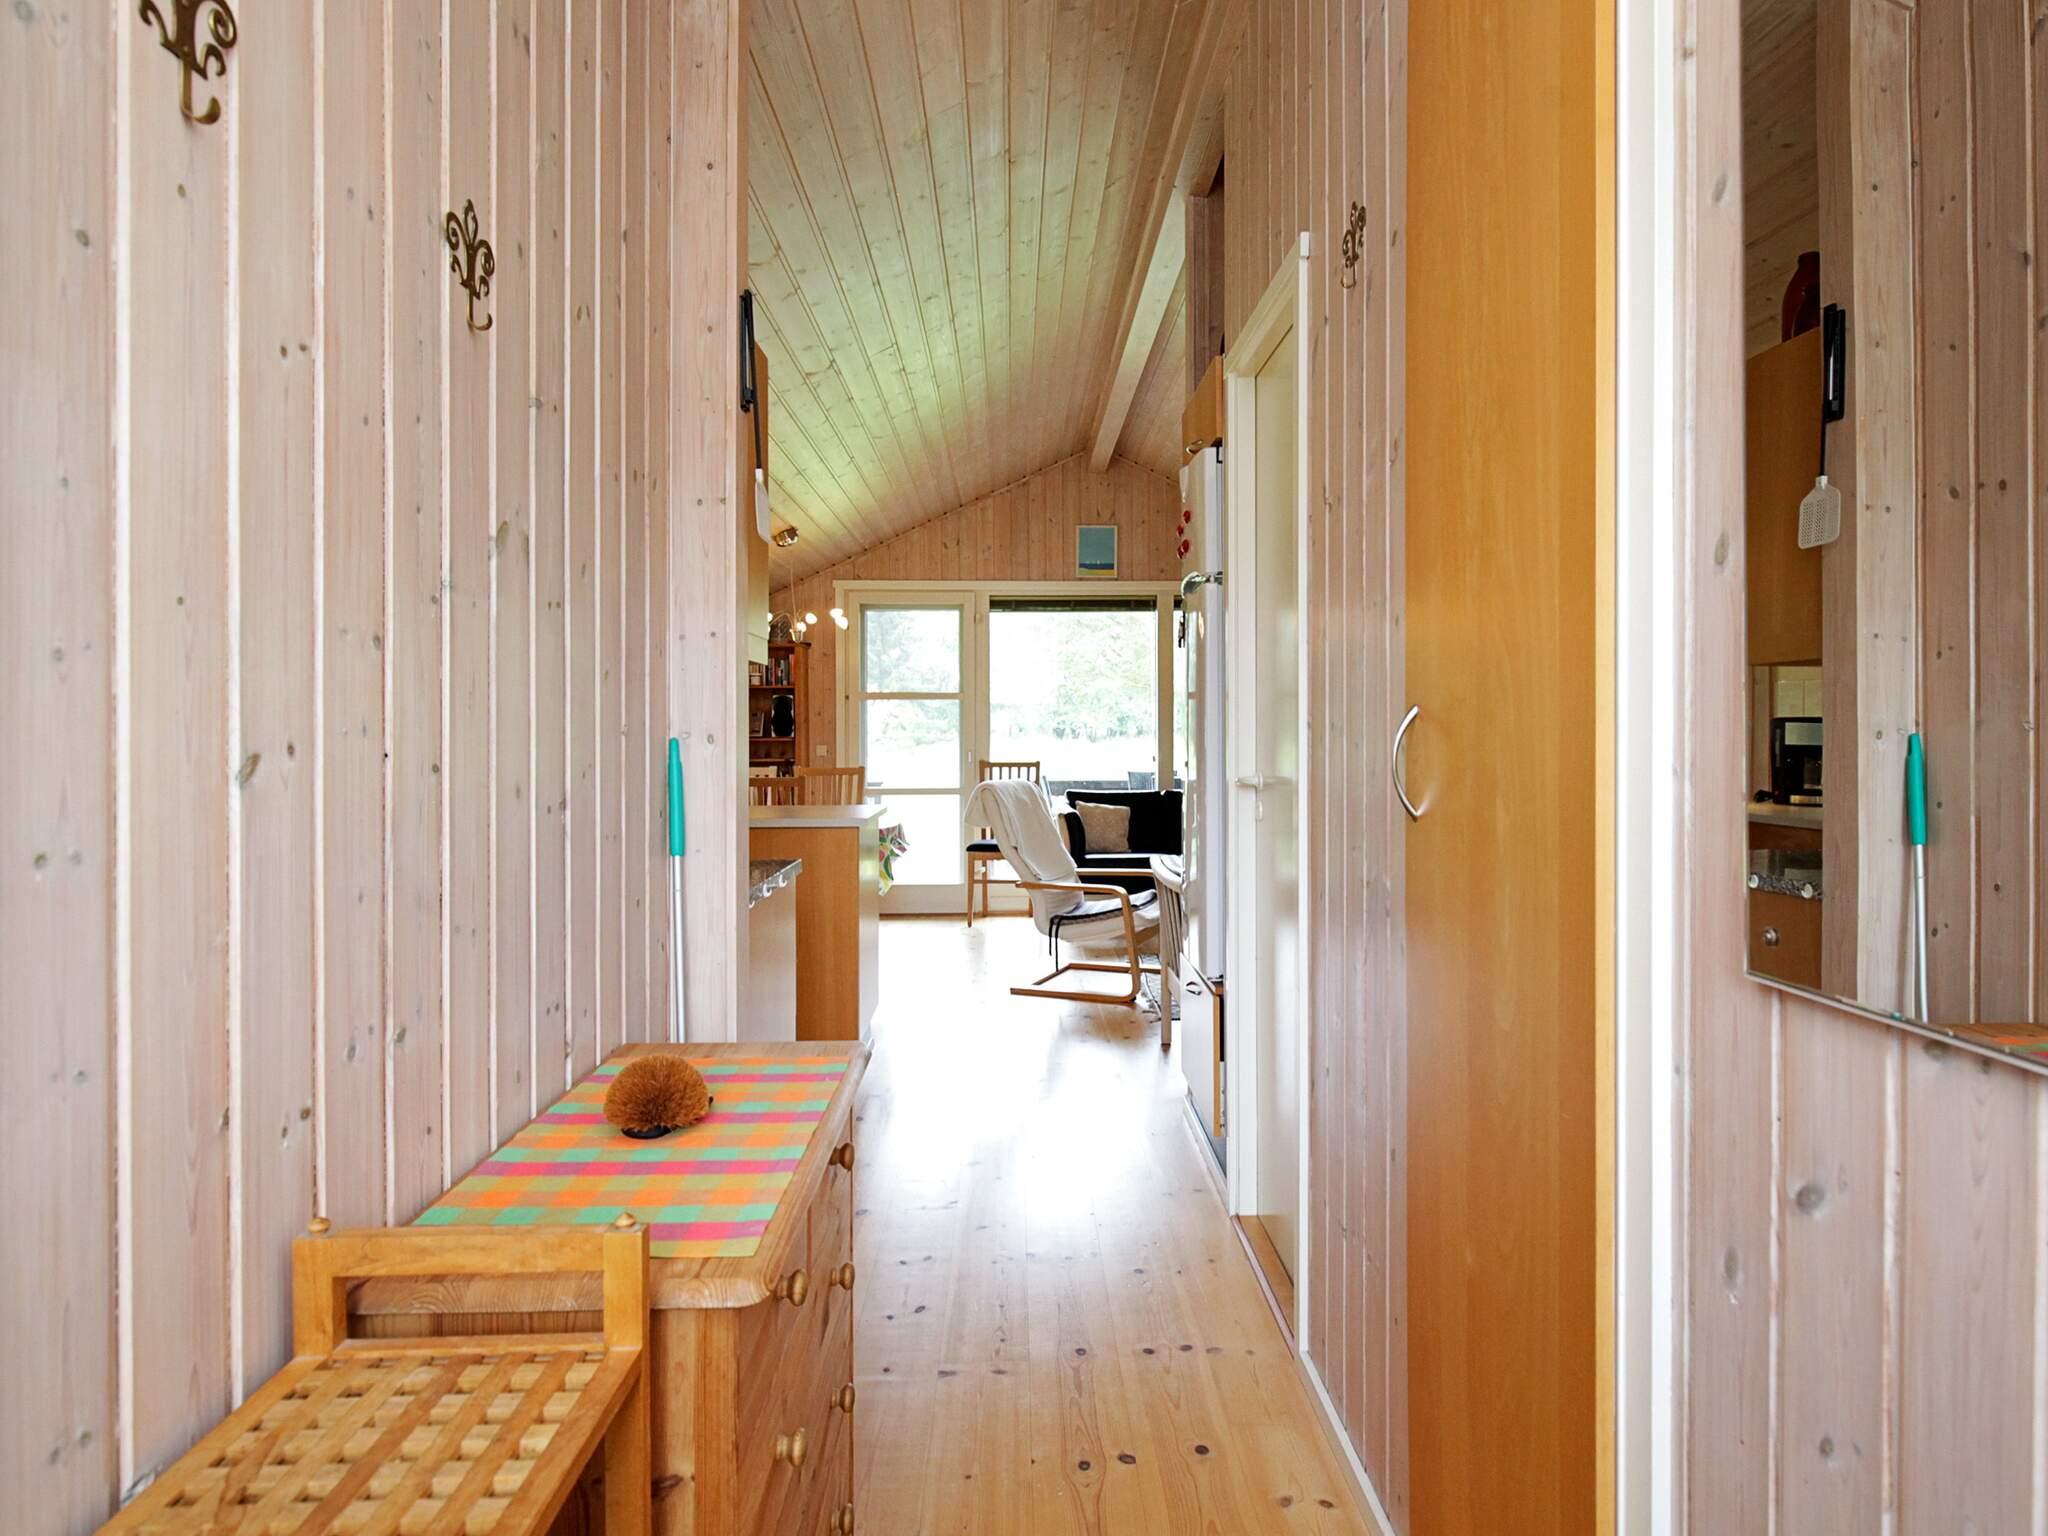 Ferienhaus Hyllingeriis (619896), Skibby, , Nordseeland, Dänemark, Bild 2